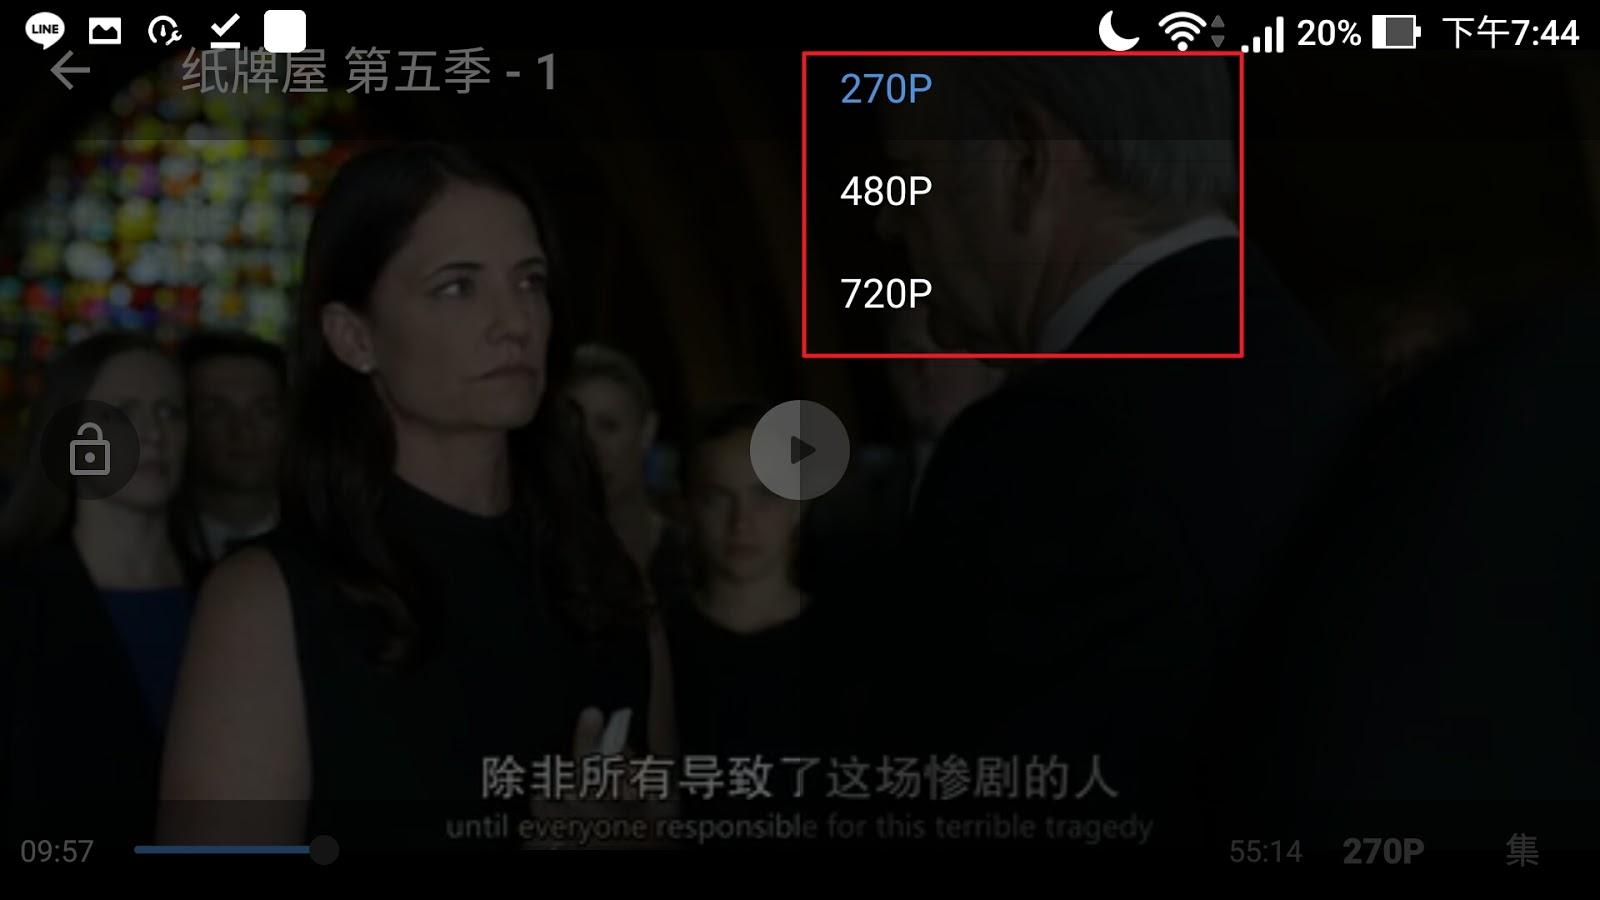 Screenshot 20170602 194414 - 酷播復活!《123Kubo》手機App,速度超快、片源豐富,還能下載離線撥放!